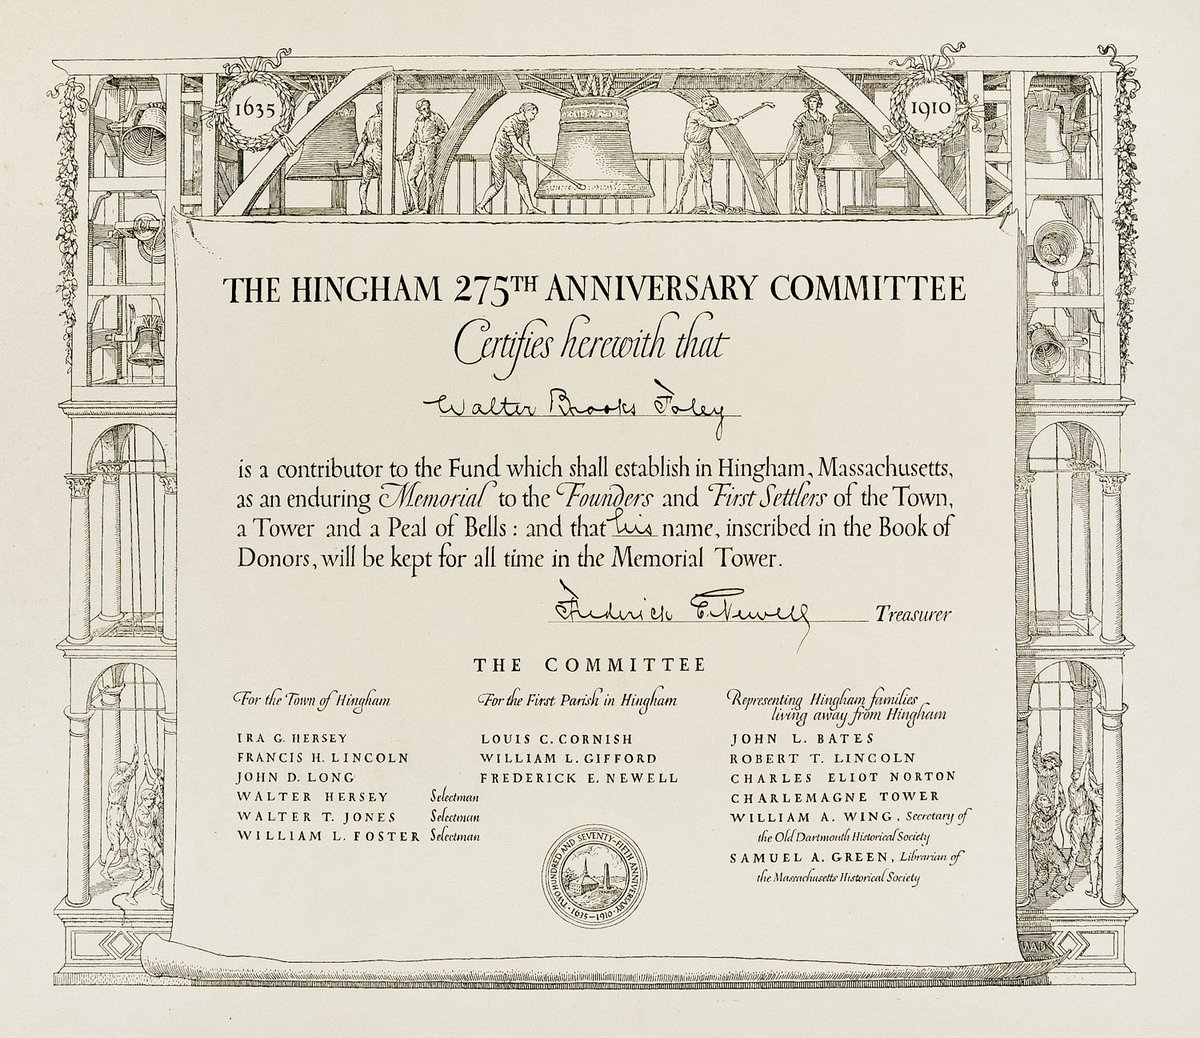 Bruce Kennett On Twitter Certificate 1910 Hand Letteringdrawing